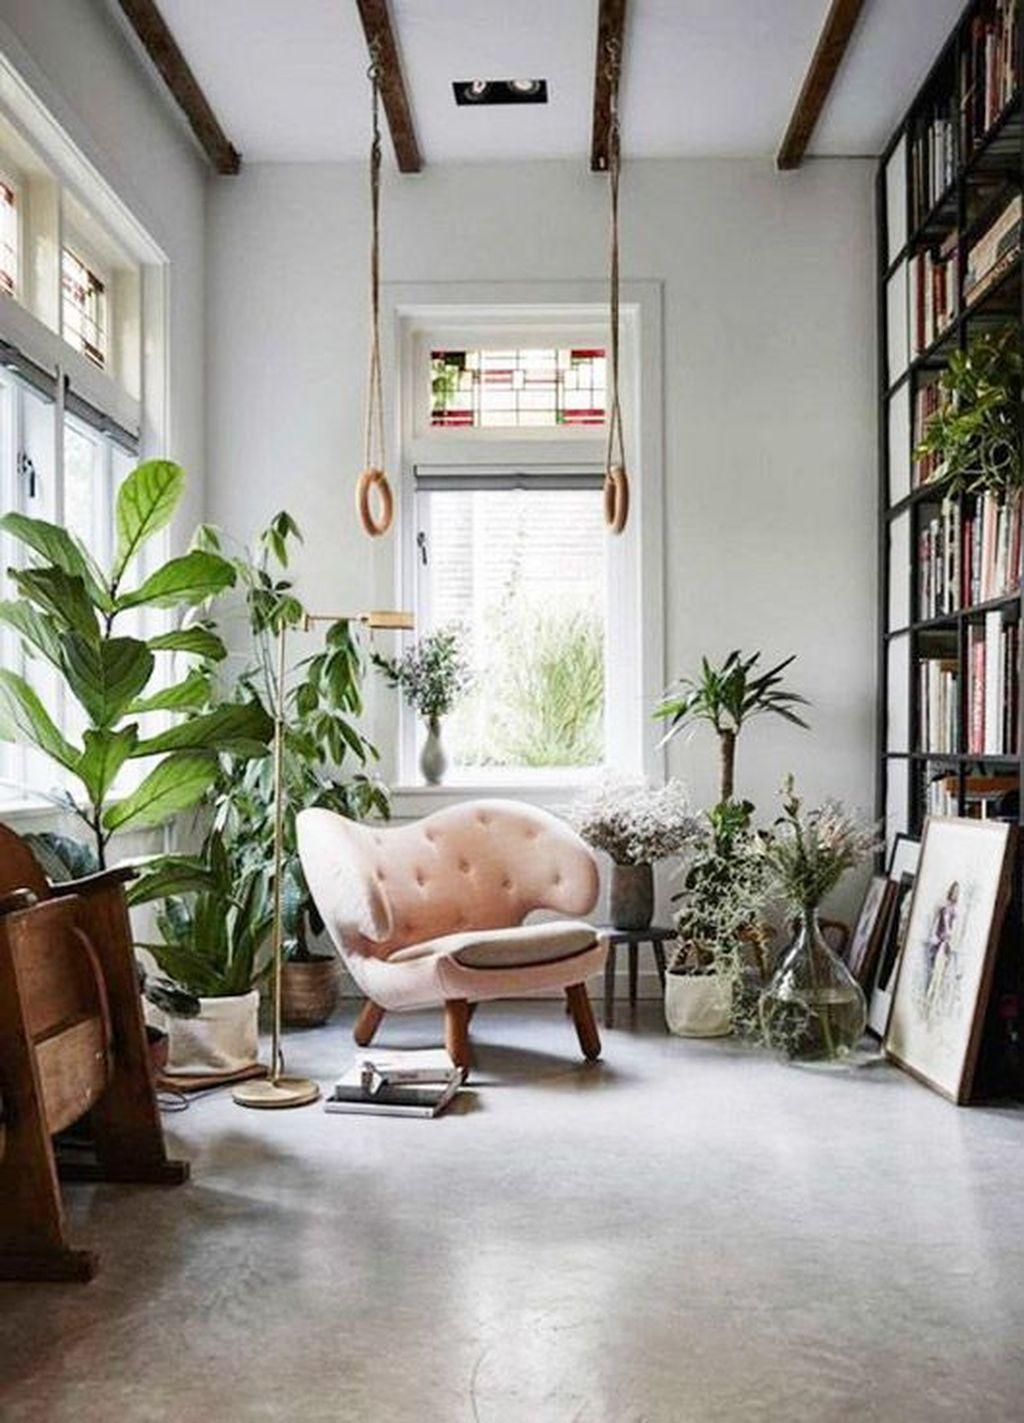 52 Cozy Reading Room For Your Interior Home Design | Interior Design ...